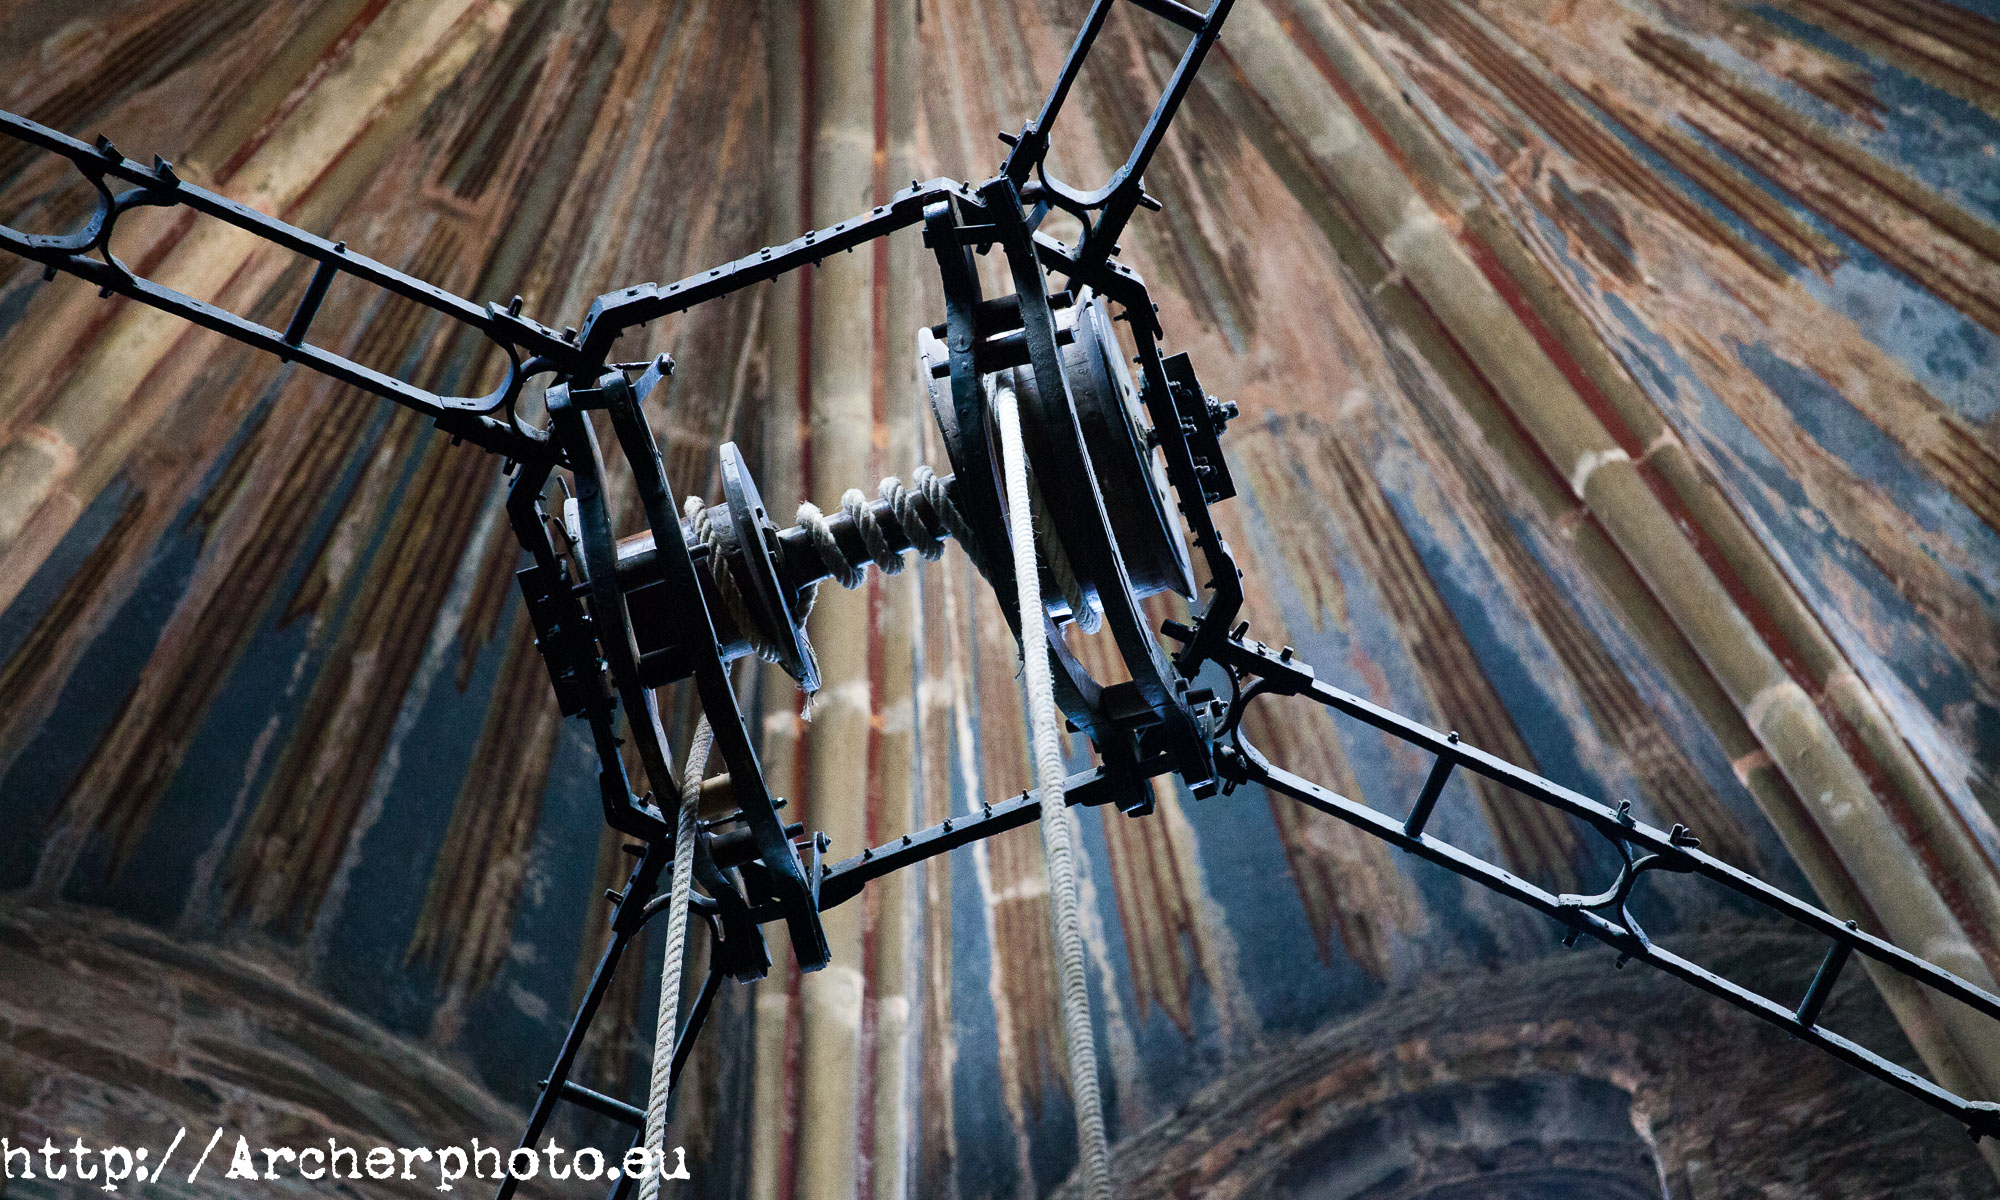 Santiago de Compostela, Archerphoto, fotógrafo profesional